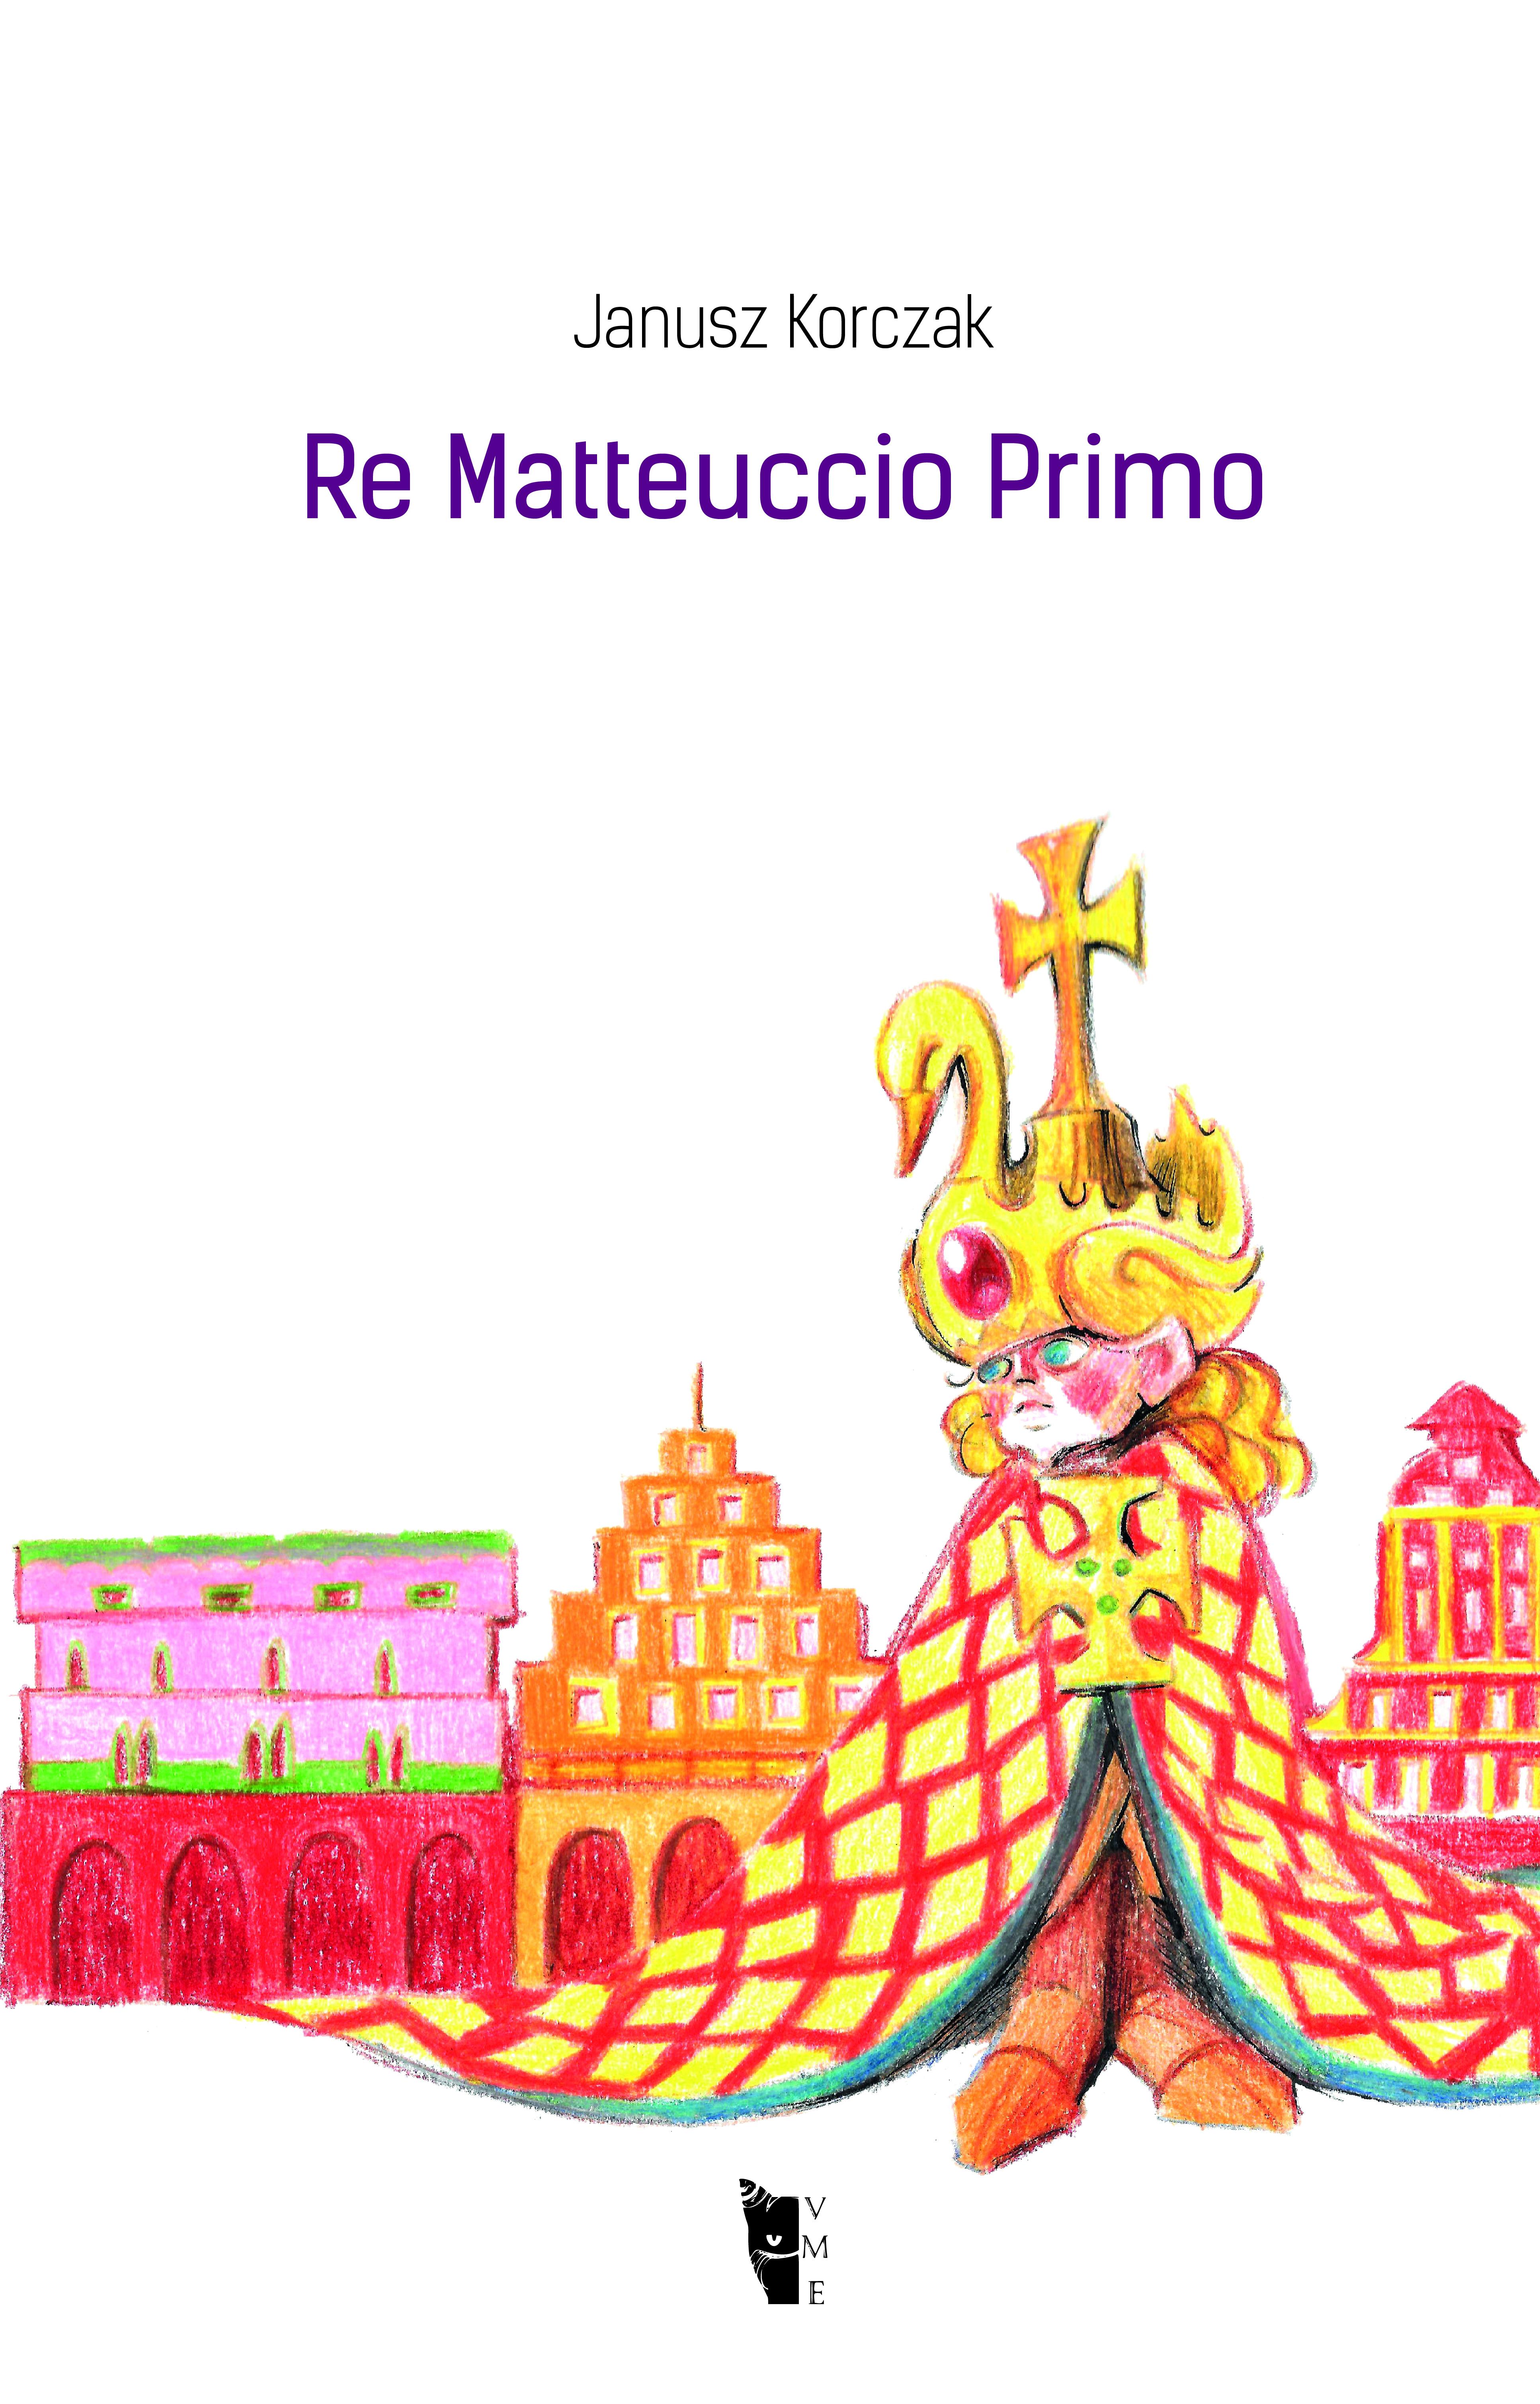 Janusz Korczak - Re Matteuccio Primo 9788894898439